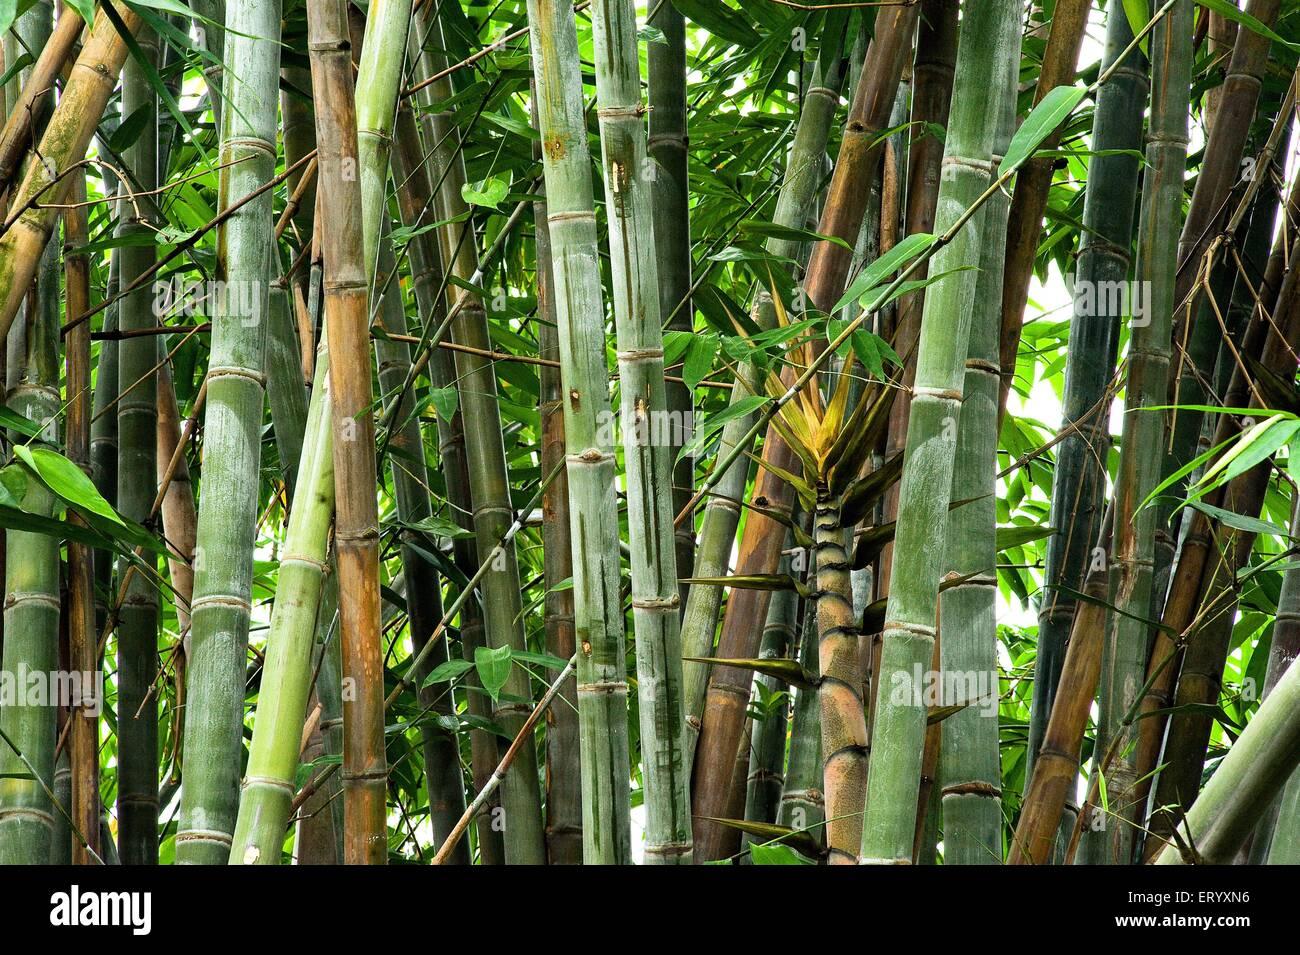 Clamp of bamboo botanical garden ; shibpur ; Calcutta Kolkata ; west Bengal ; India - Stock Image